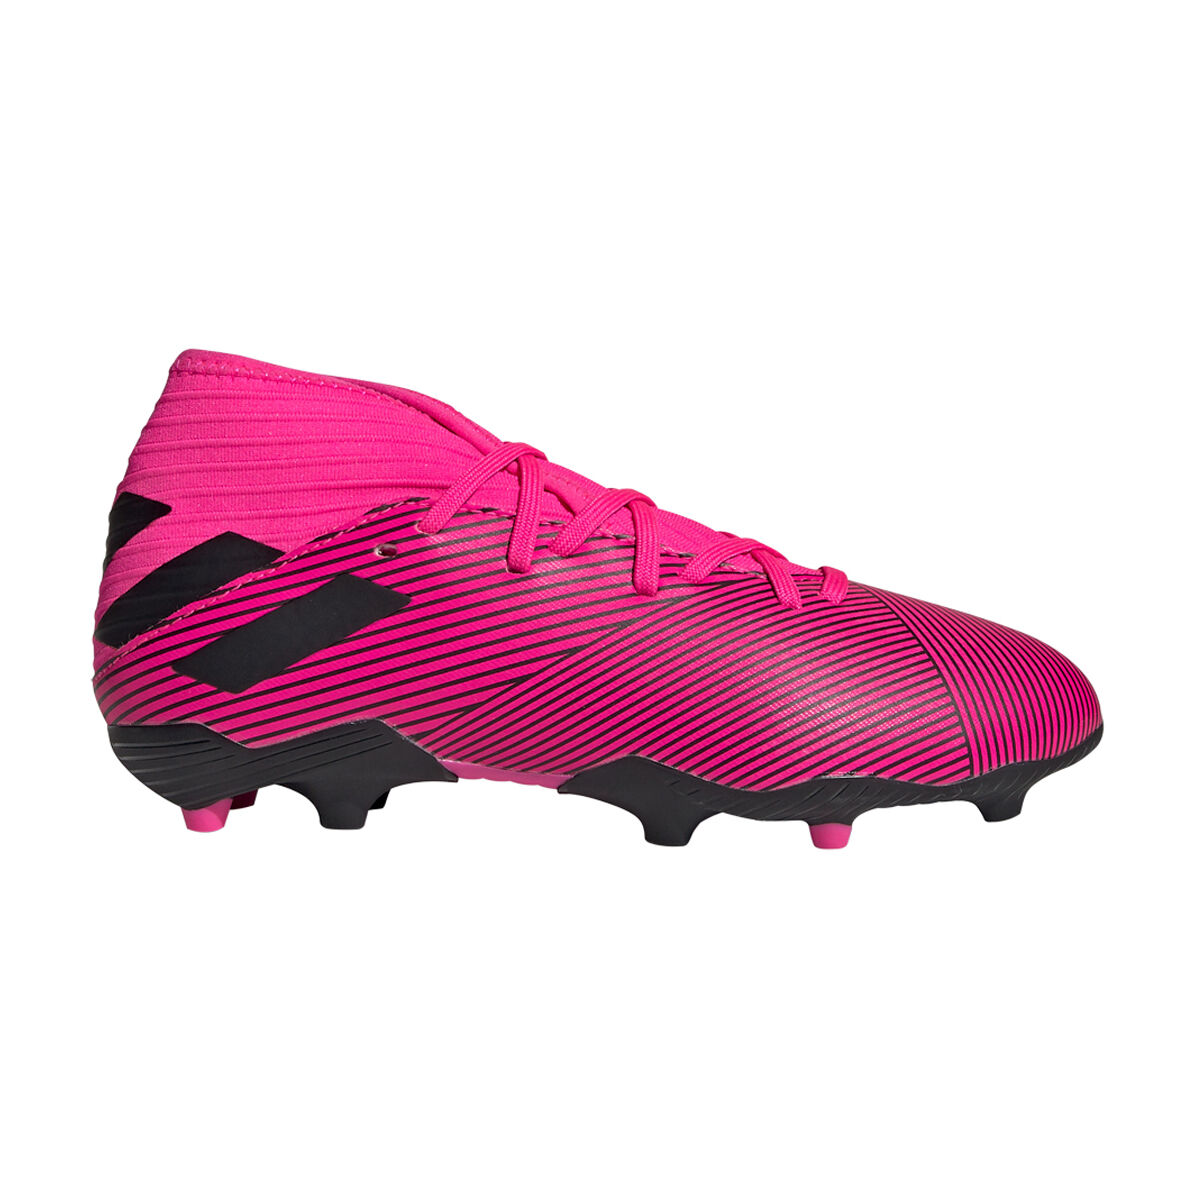 adidas Nemeziz 19.3 Kids Football Boots